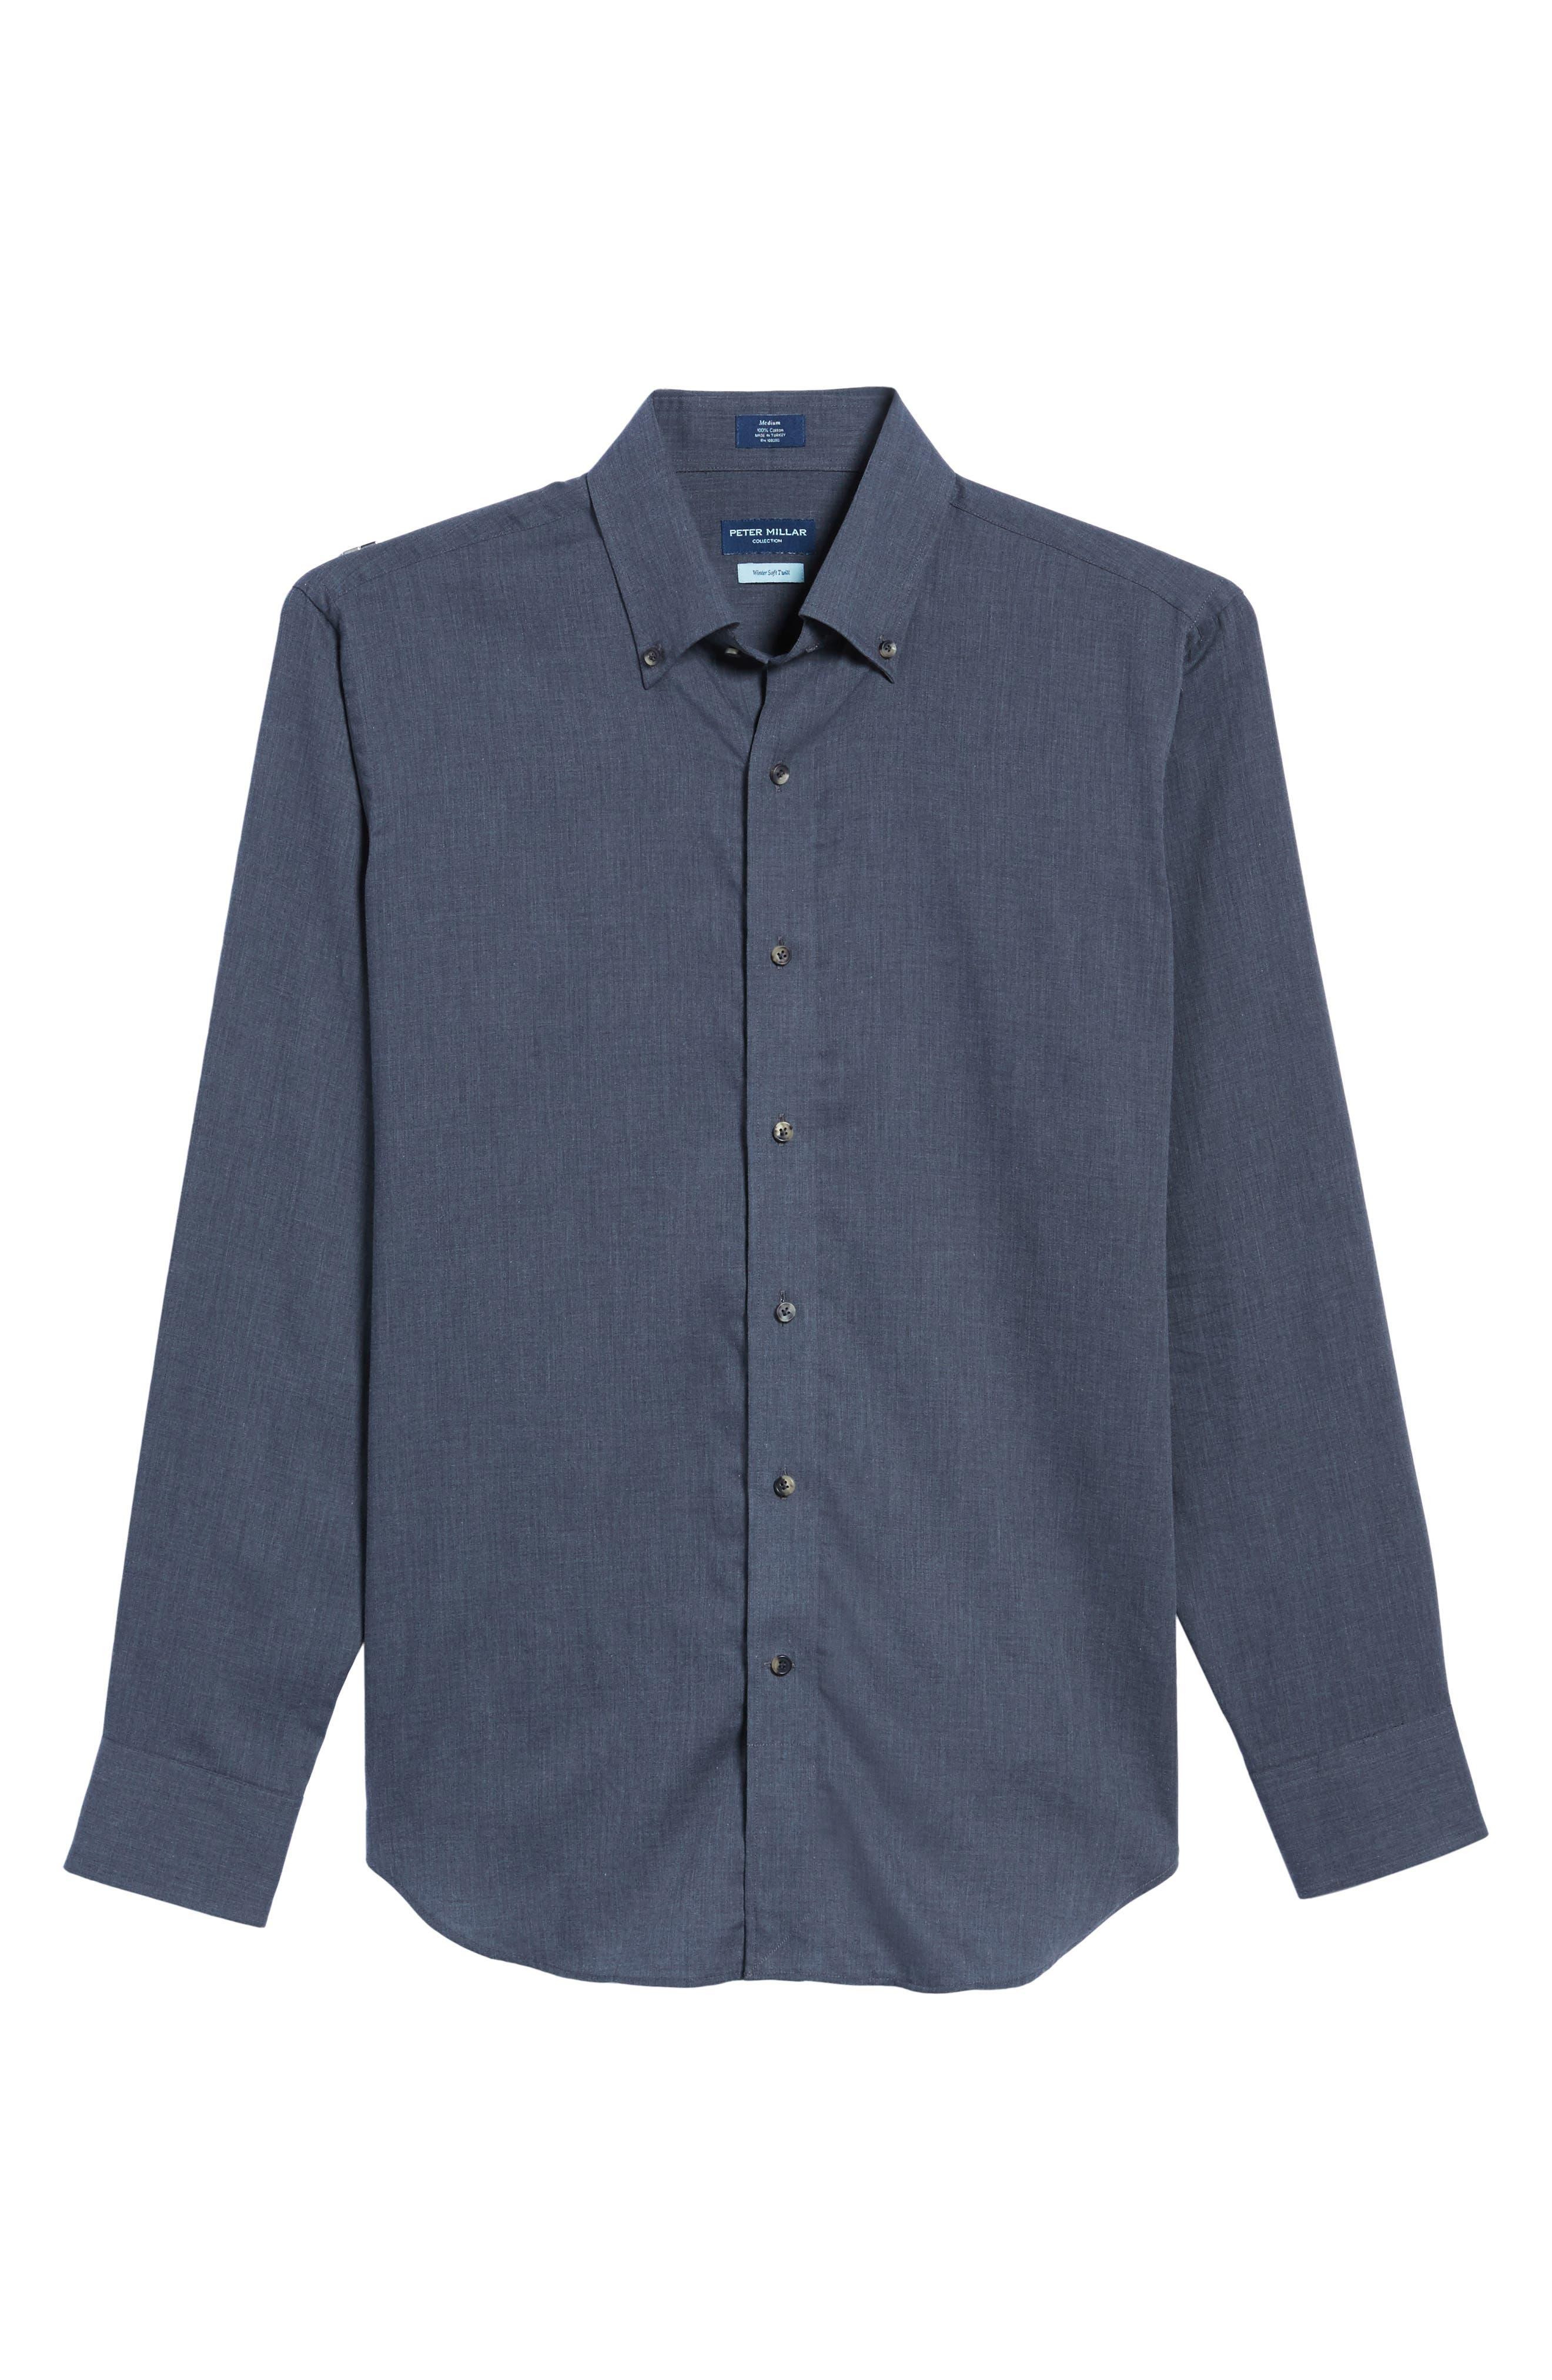 Peter Millar Regular Fit Mélange Herringbone Sport Shirt,                             Alternate thumbnail 6, color,                             039